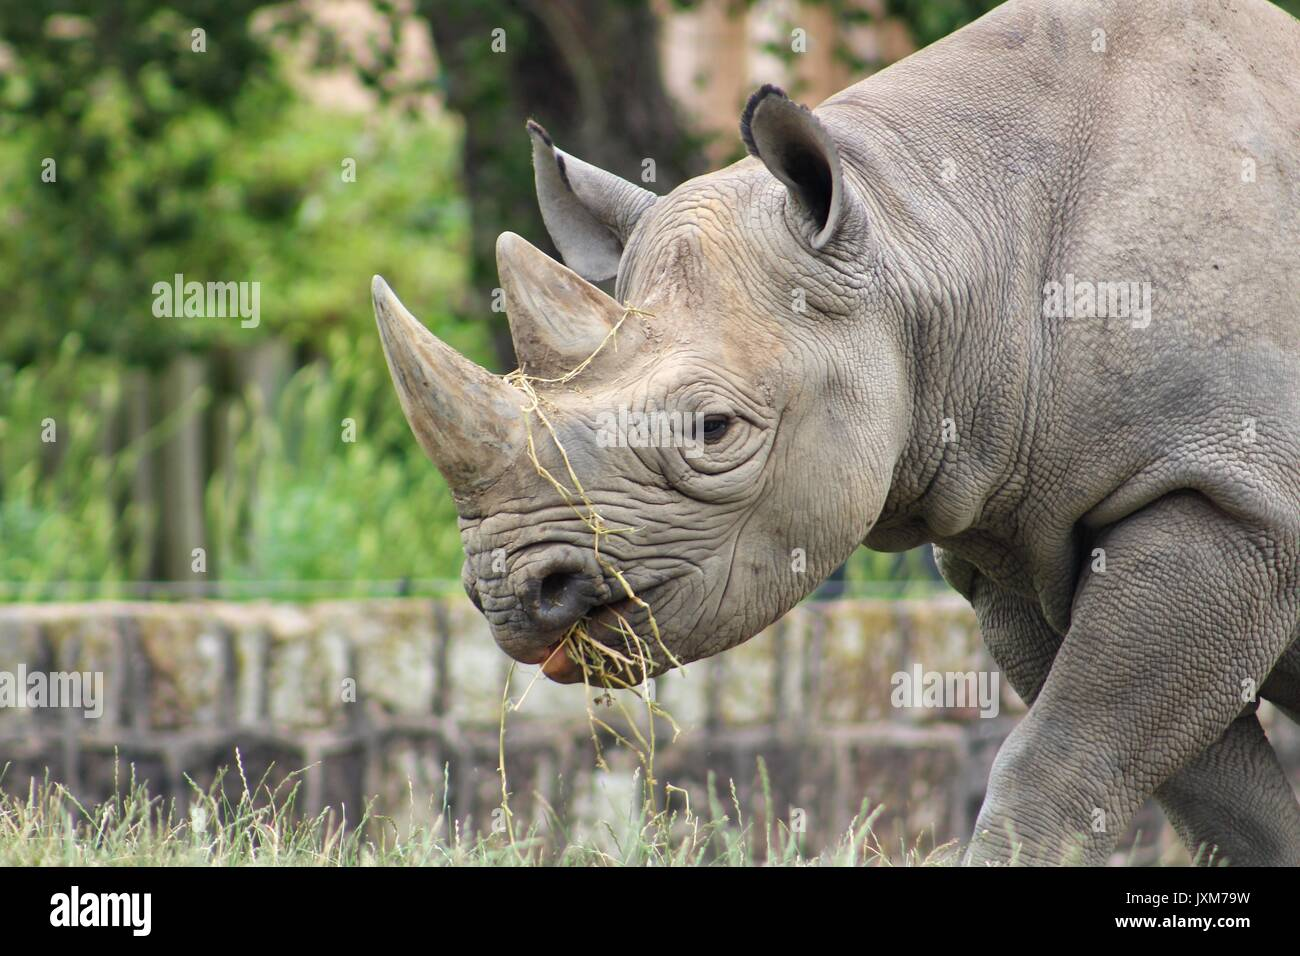 Rhinoceros, black rhino, rhino - Stock Image